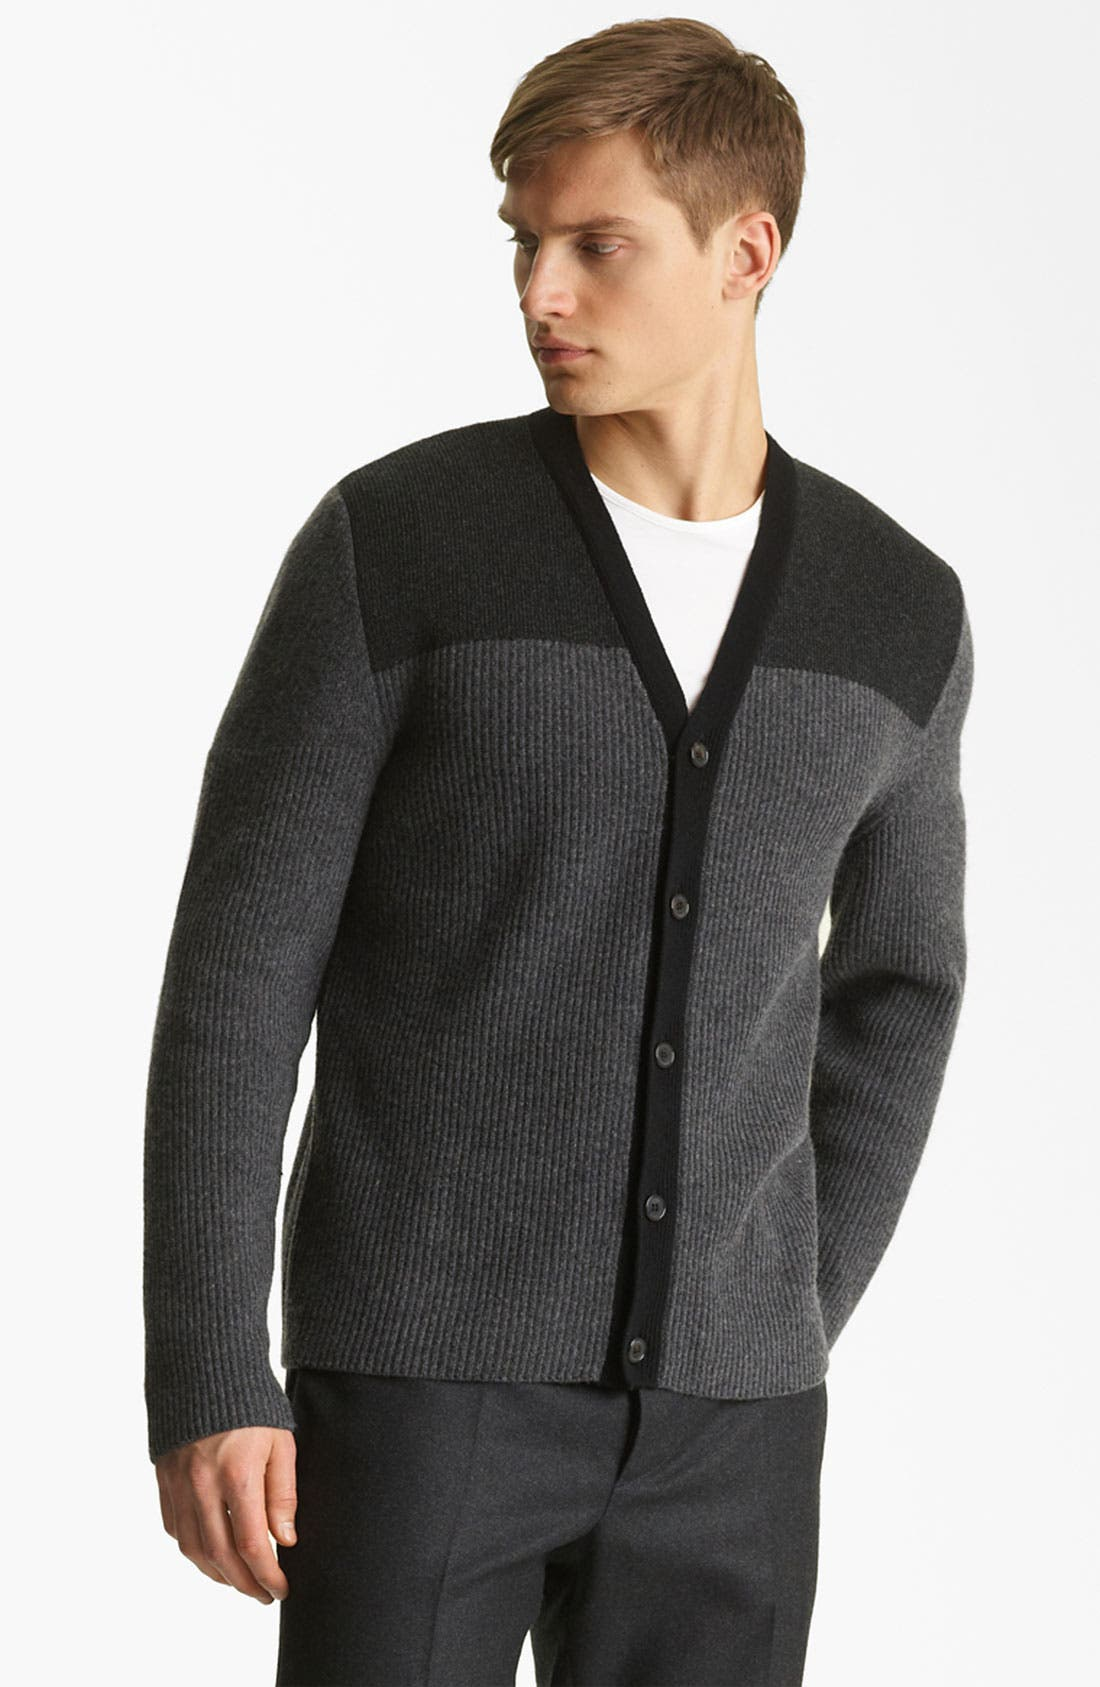 Alternate Image 1 Selected - Marni Two Tone Wool & Cashmere Cardigan